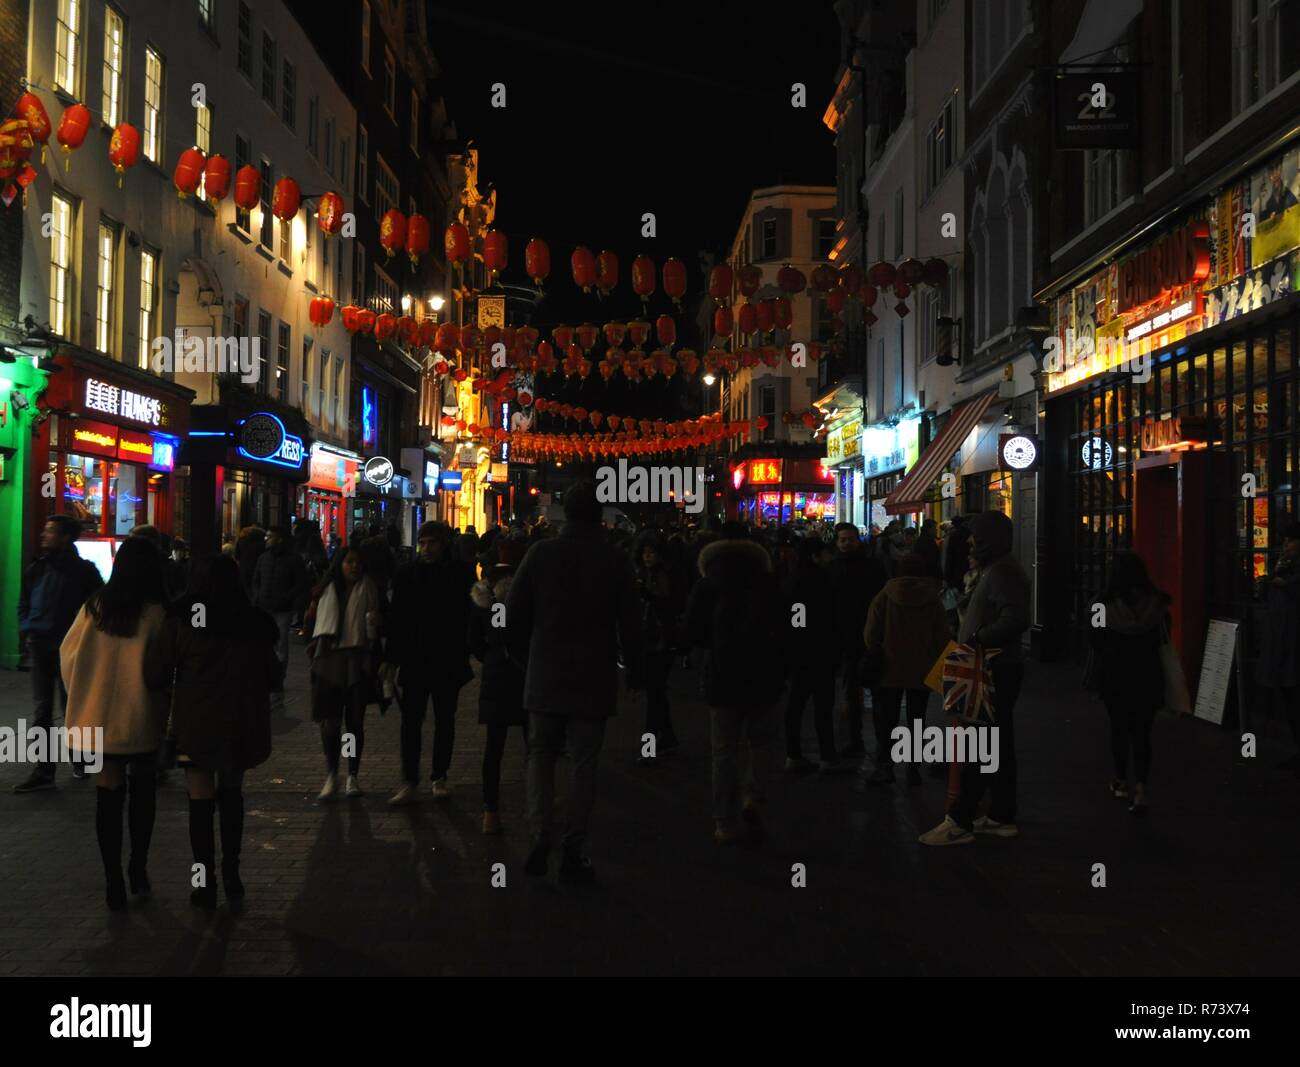 Pedestrians on Wardour Street, Soho, London, UK. - Stock Image